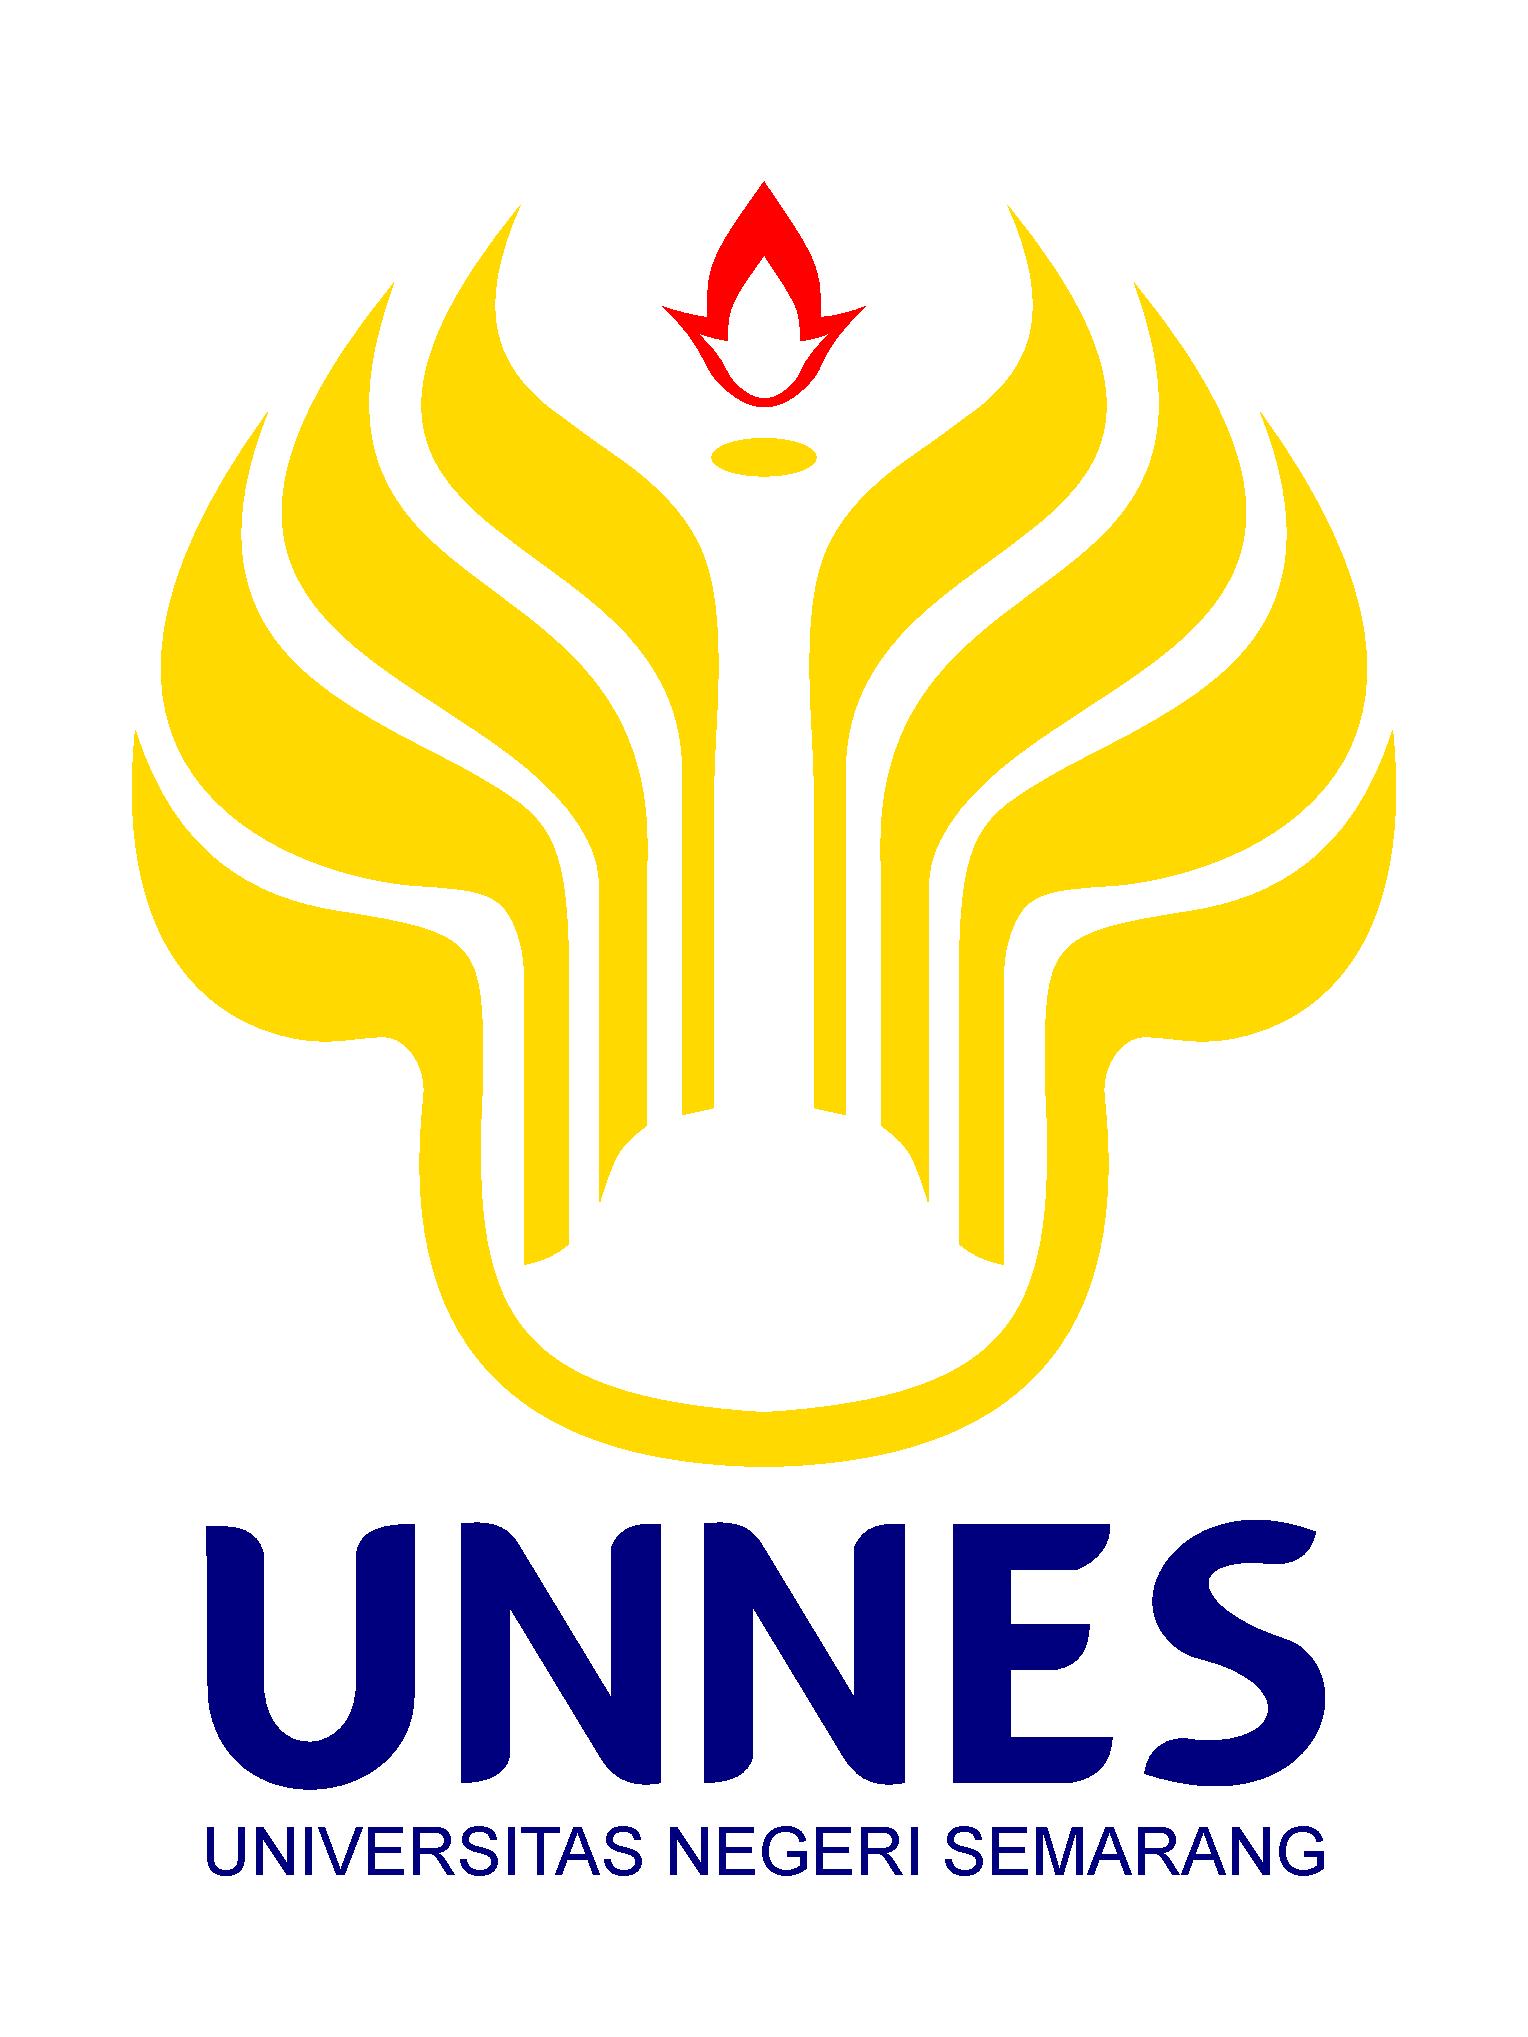 Universitas Negeri Semarang, Indonesia